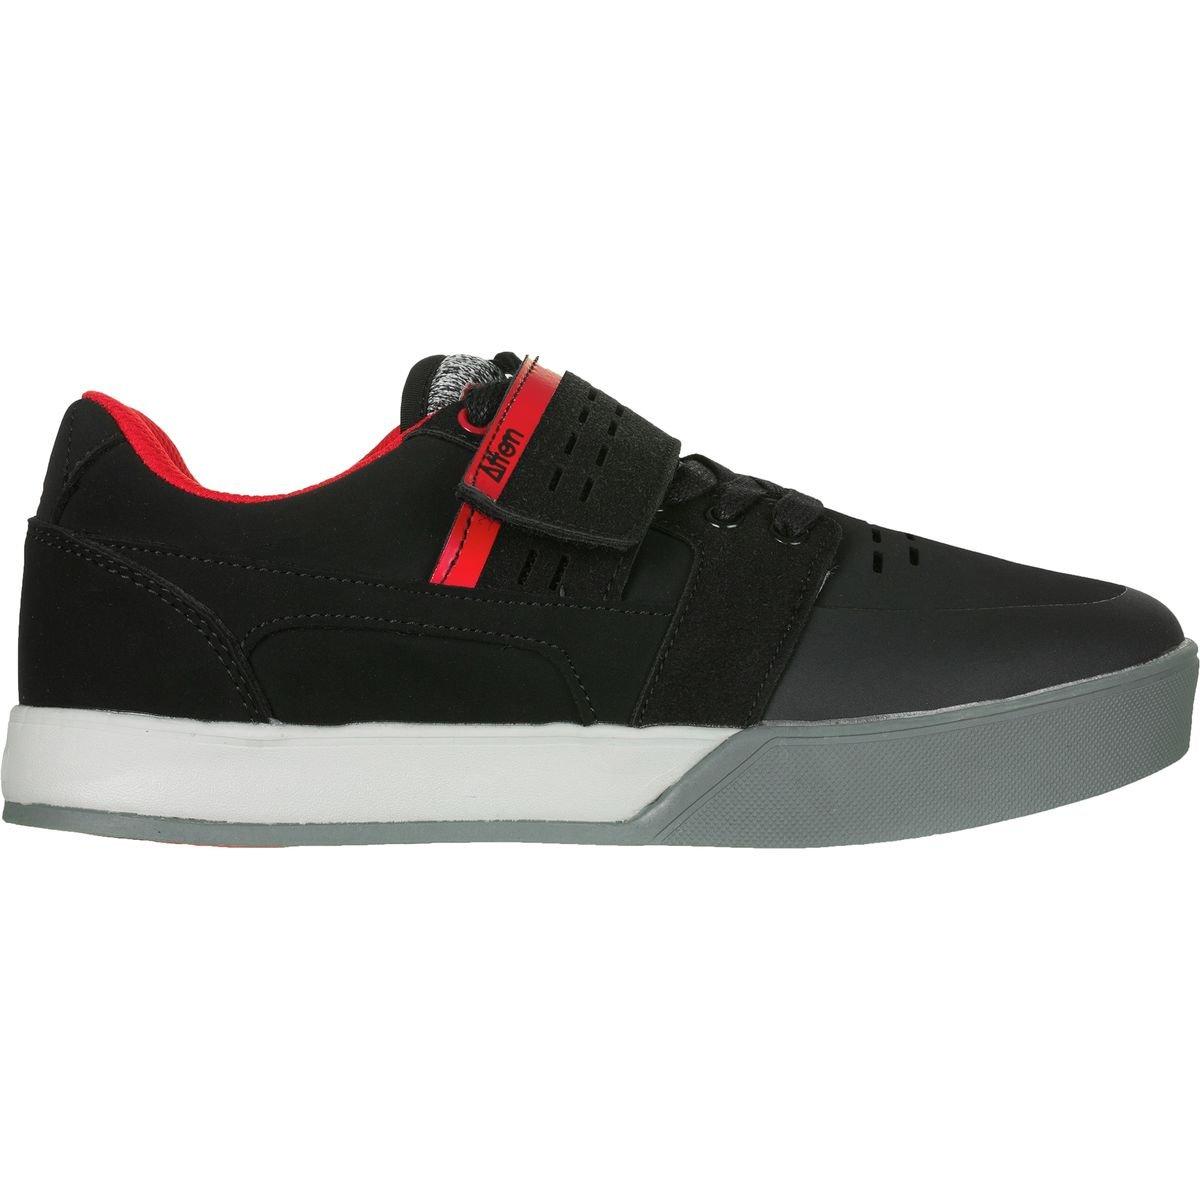 Afton Vectal Shoe – Men 'sブラック/レッド、9.5   B077MRBRWD